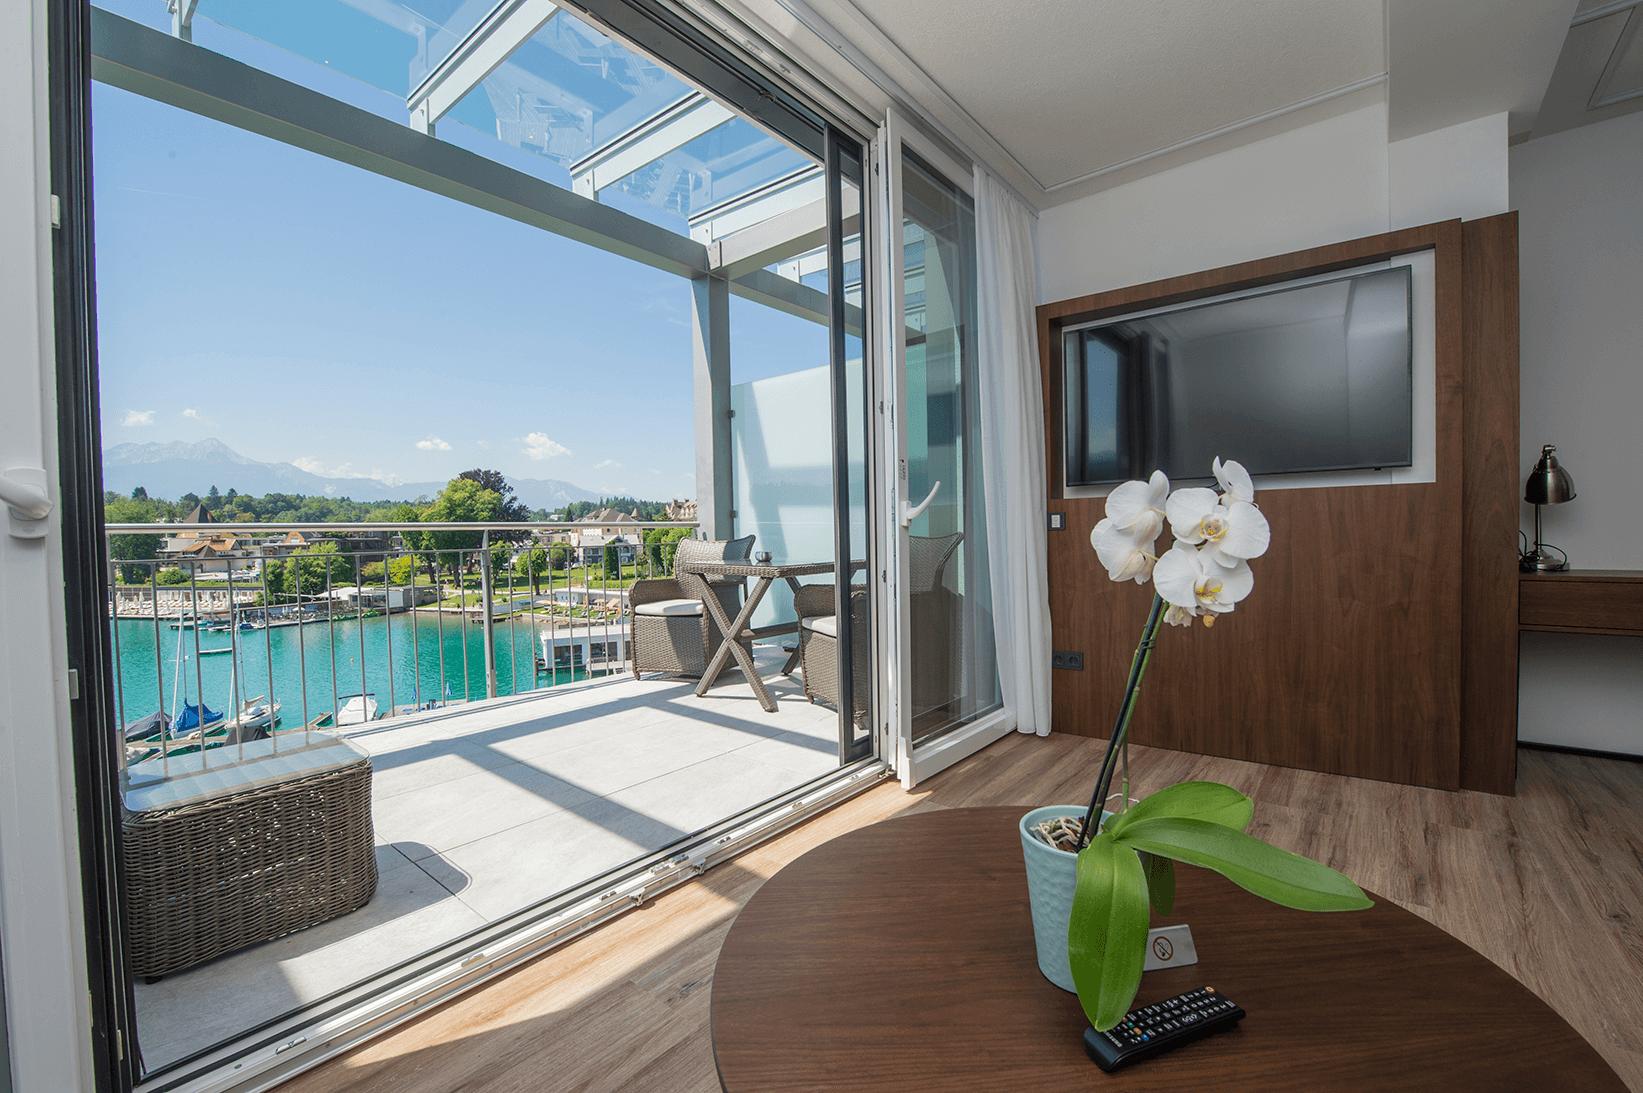 Terrasse_Suite_direkter Seeblick_Obergeschoß_Boutiquehotel_Wörthersee